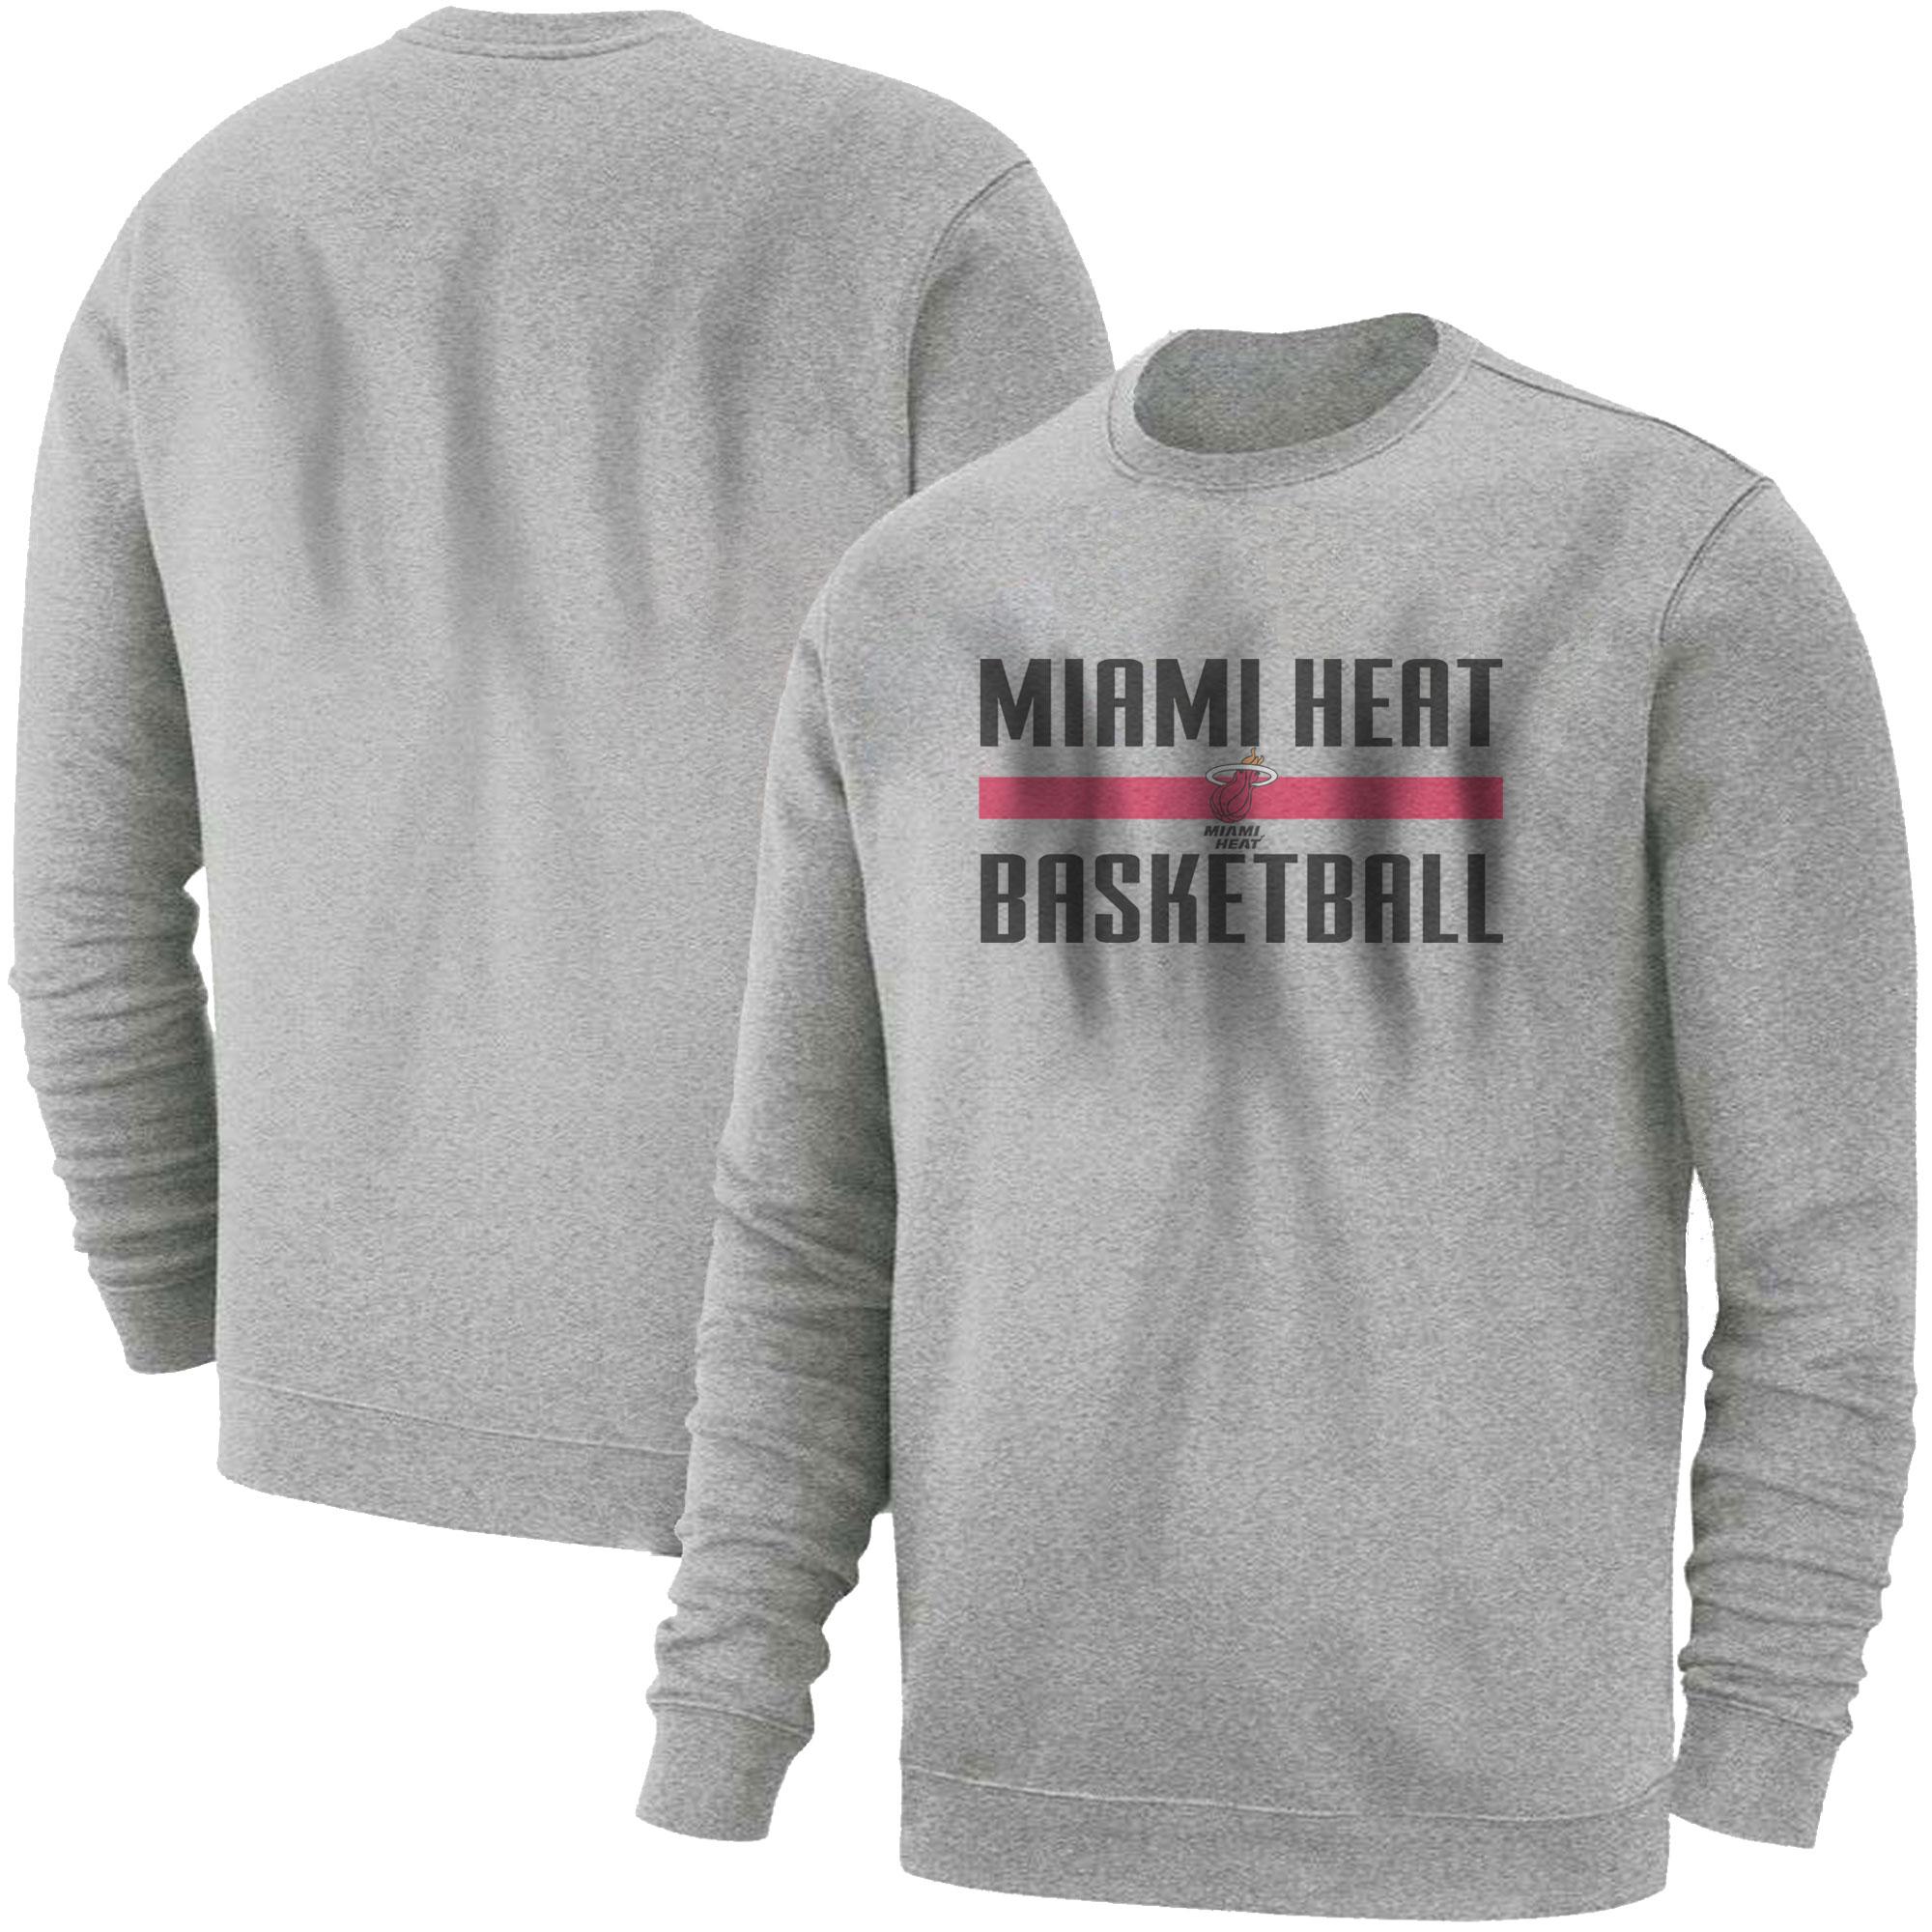 Miami Heat Basketball Basic (BSC-GRY-NP-miami-bsktbll-528)